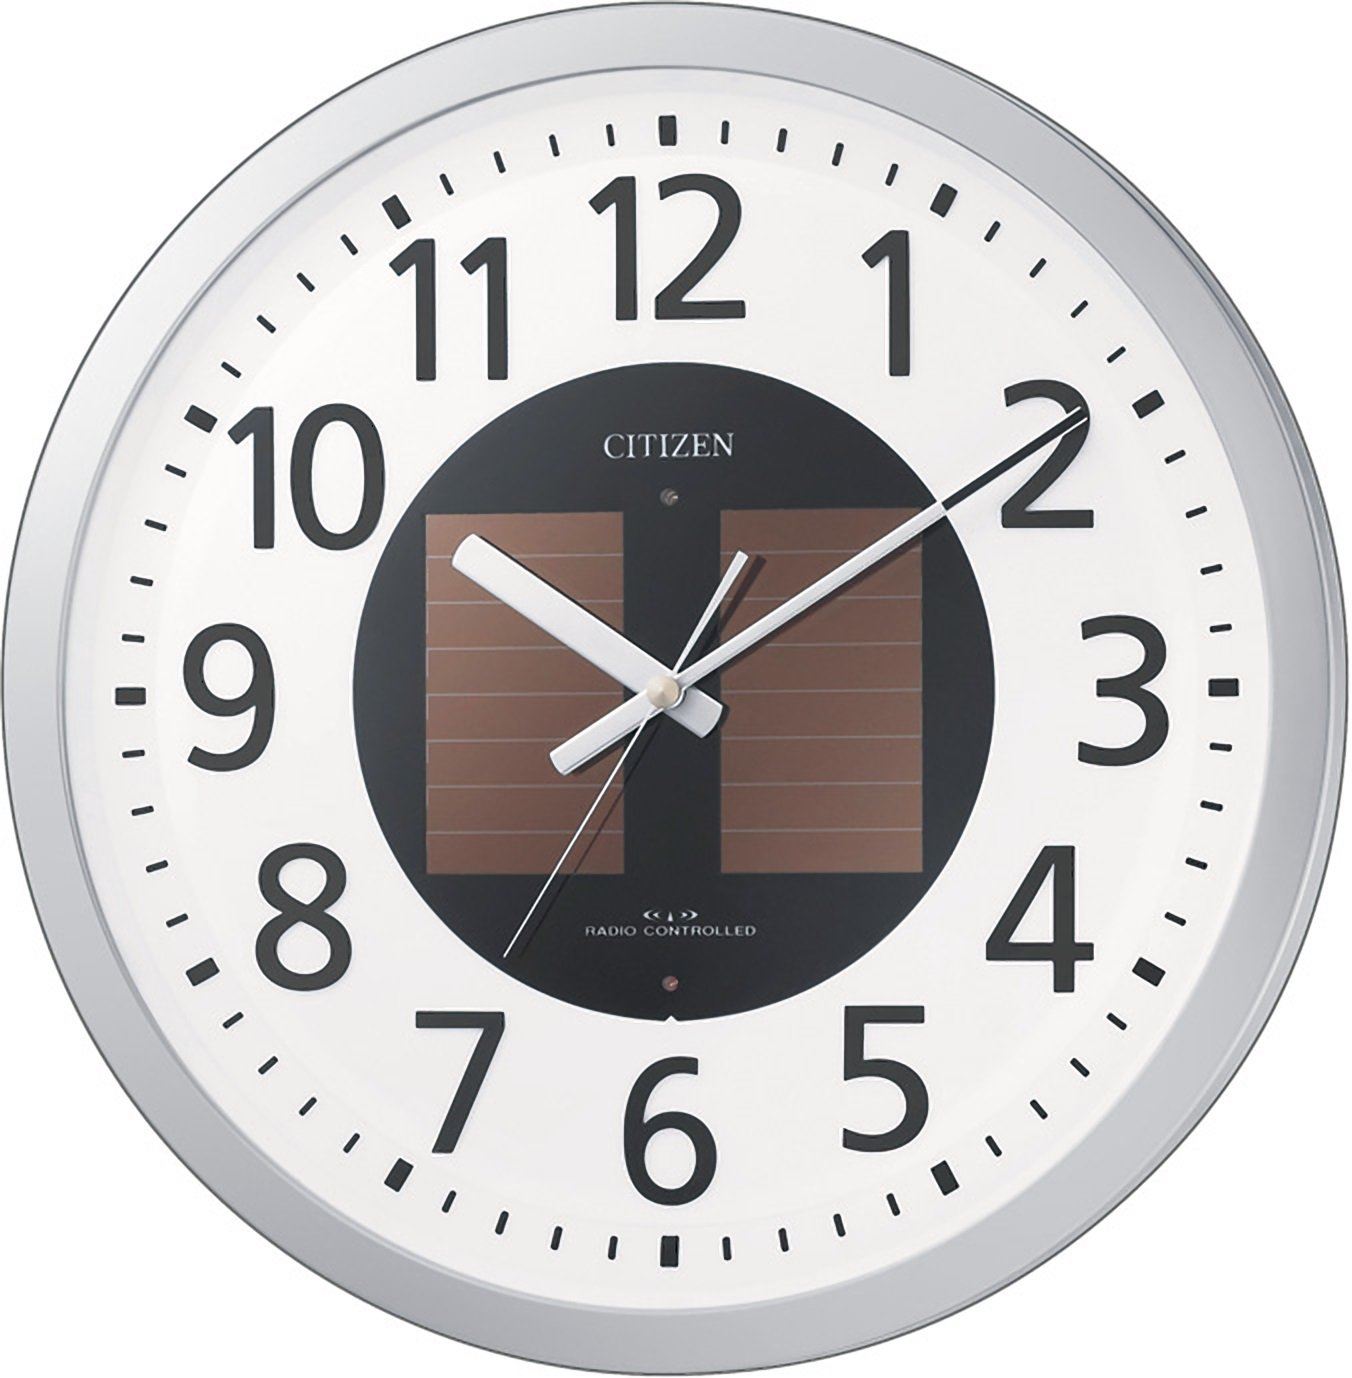 CITIZEN (シチズン) 電波ソーラー掛時計 エコライフM815 4MY815-019 4MY815-019 B005UVALLC